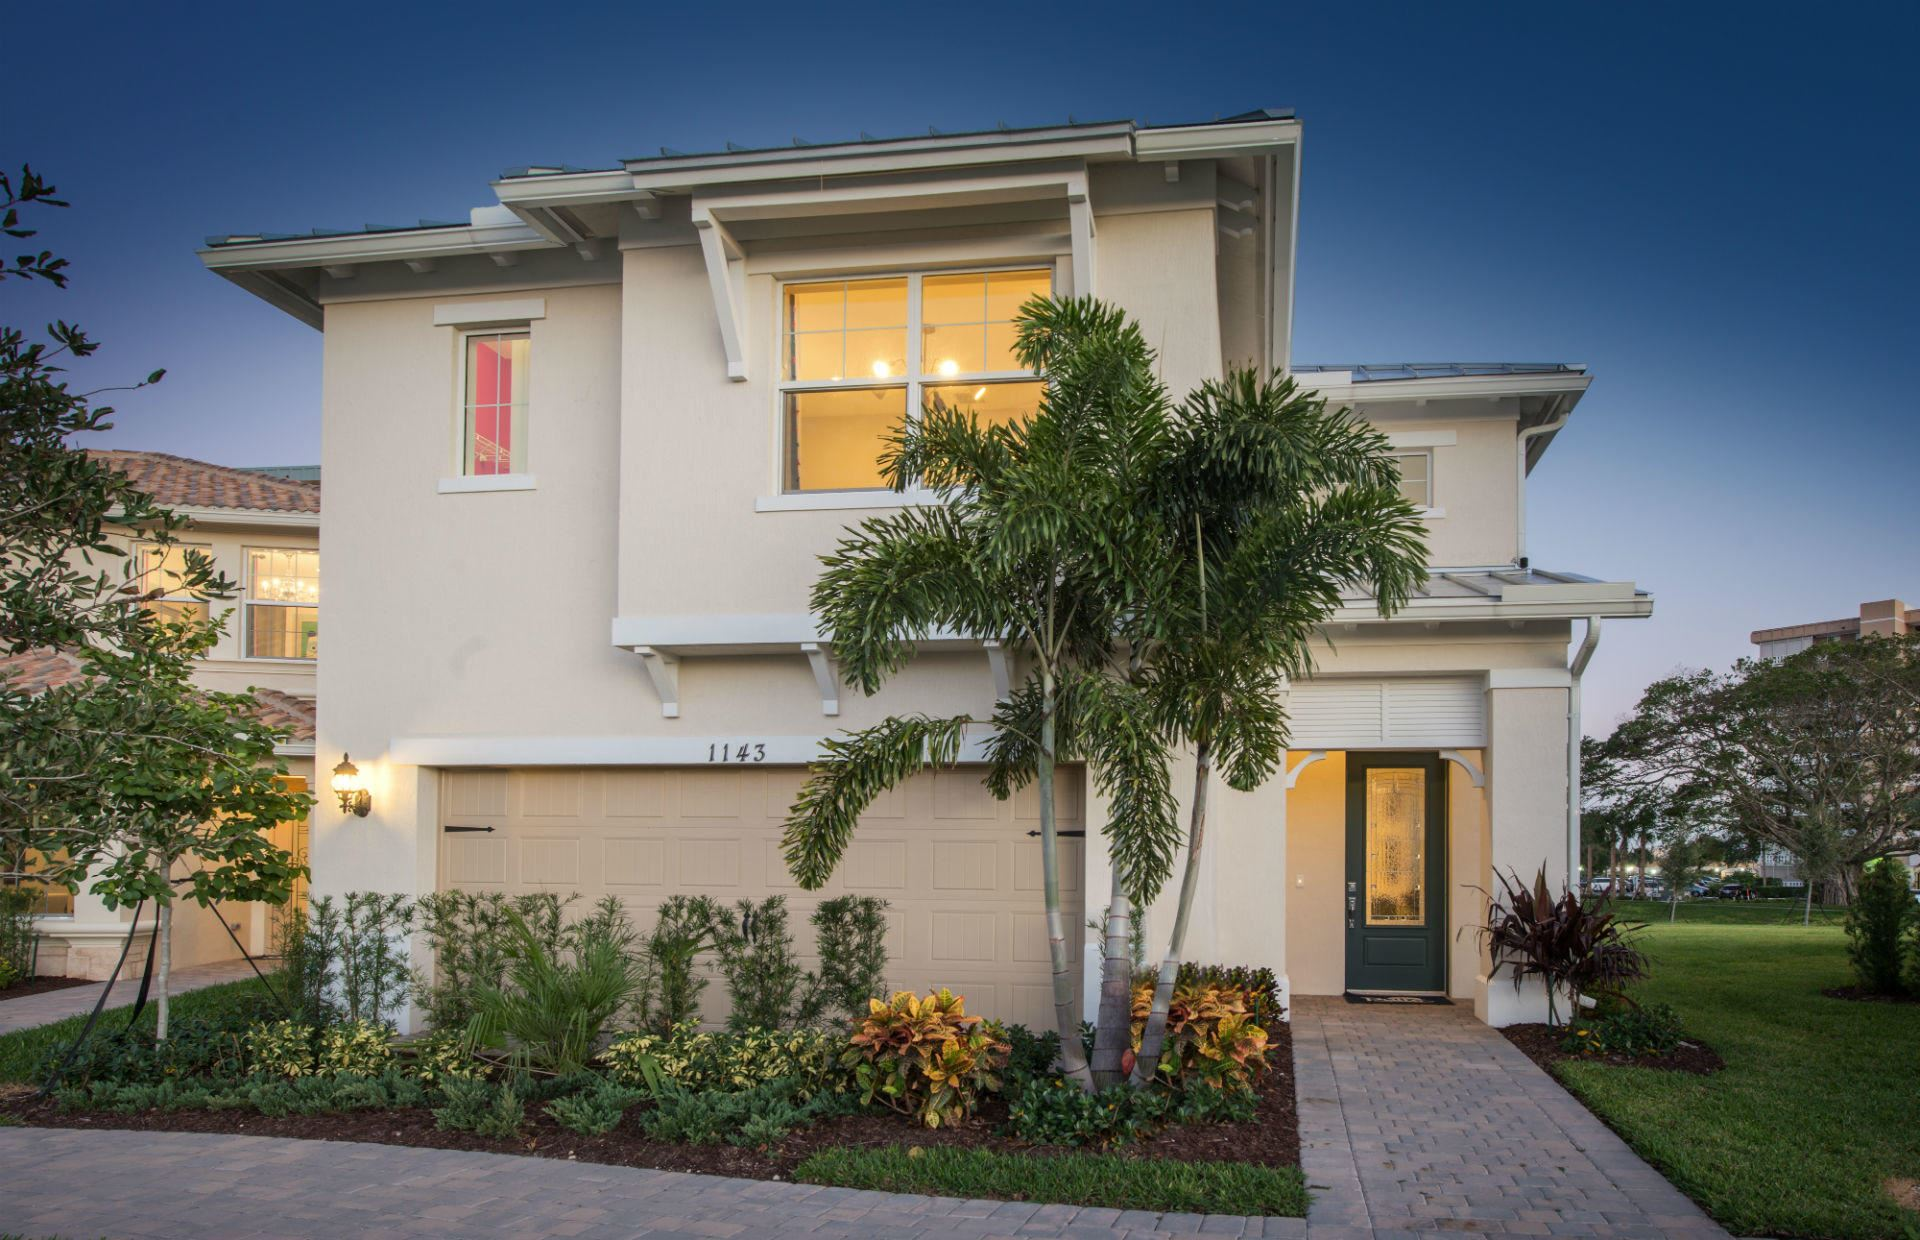 1143 Large Leaf Lane, Hollywood, FL 33021 - MLS#: RX-10717438